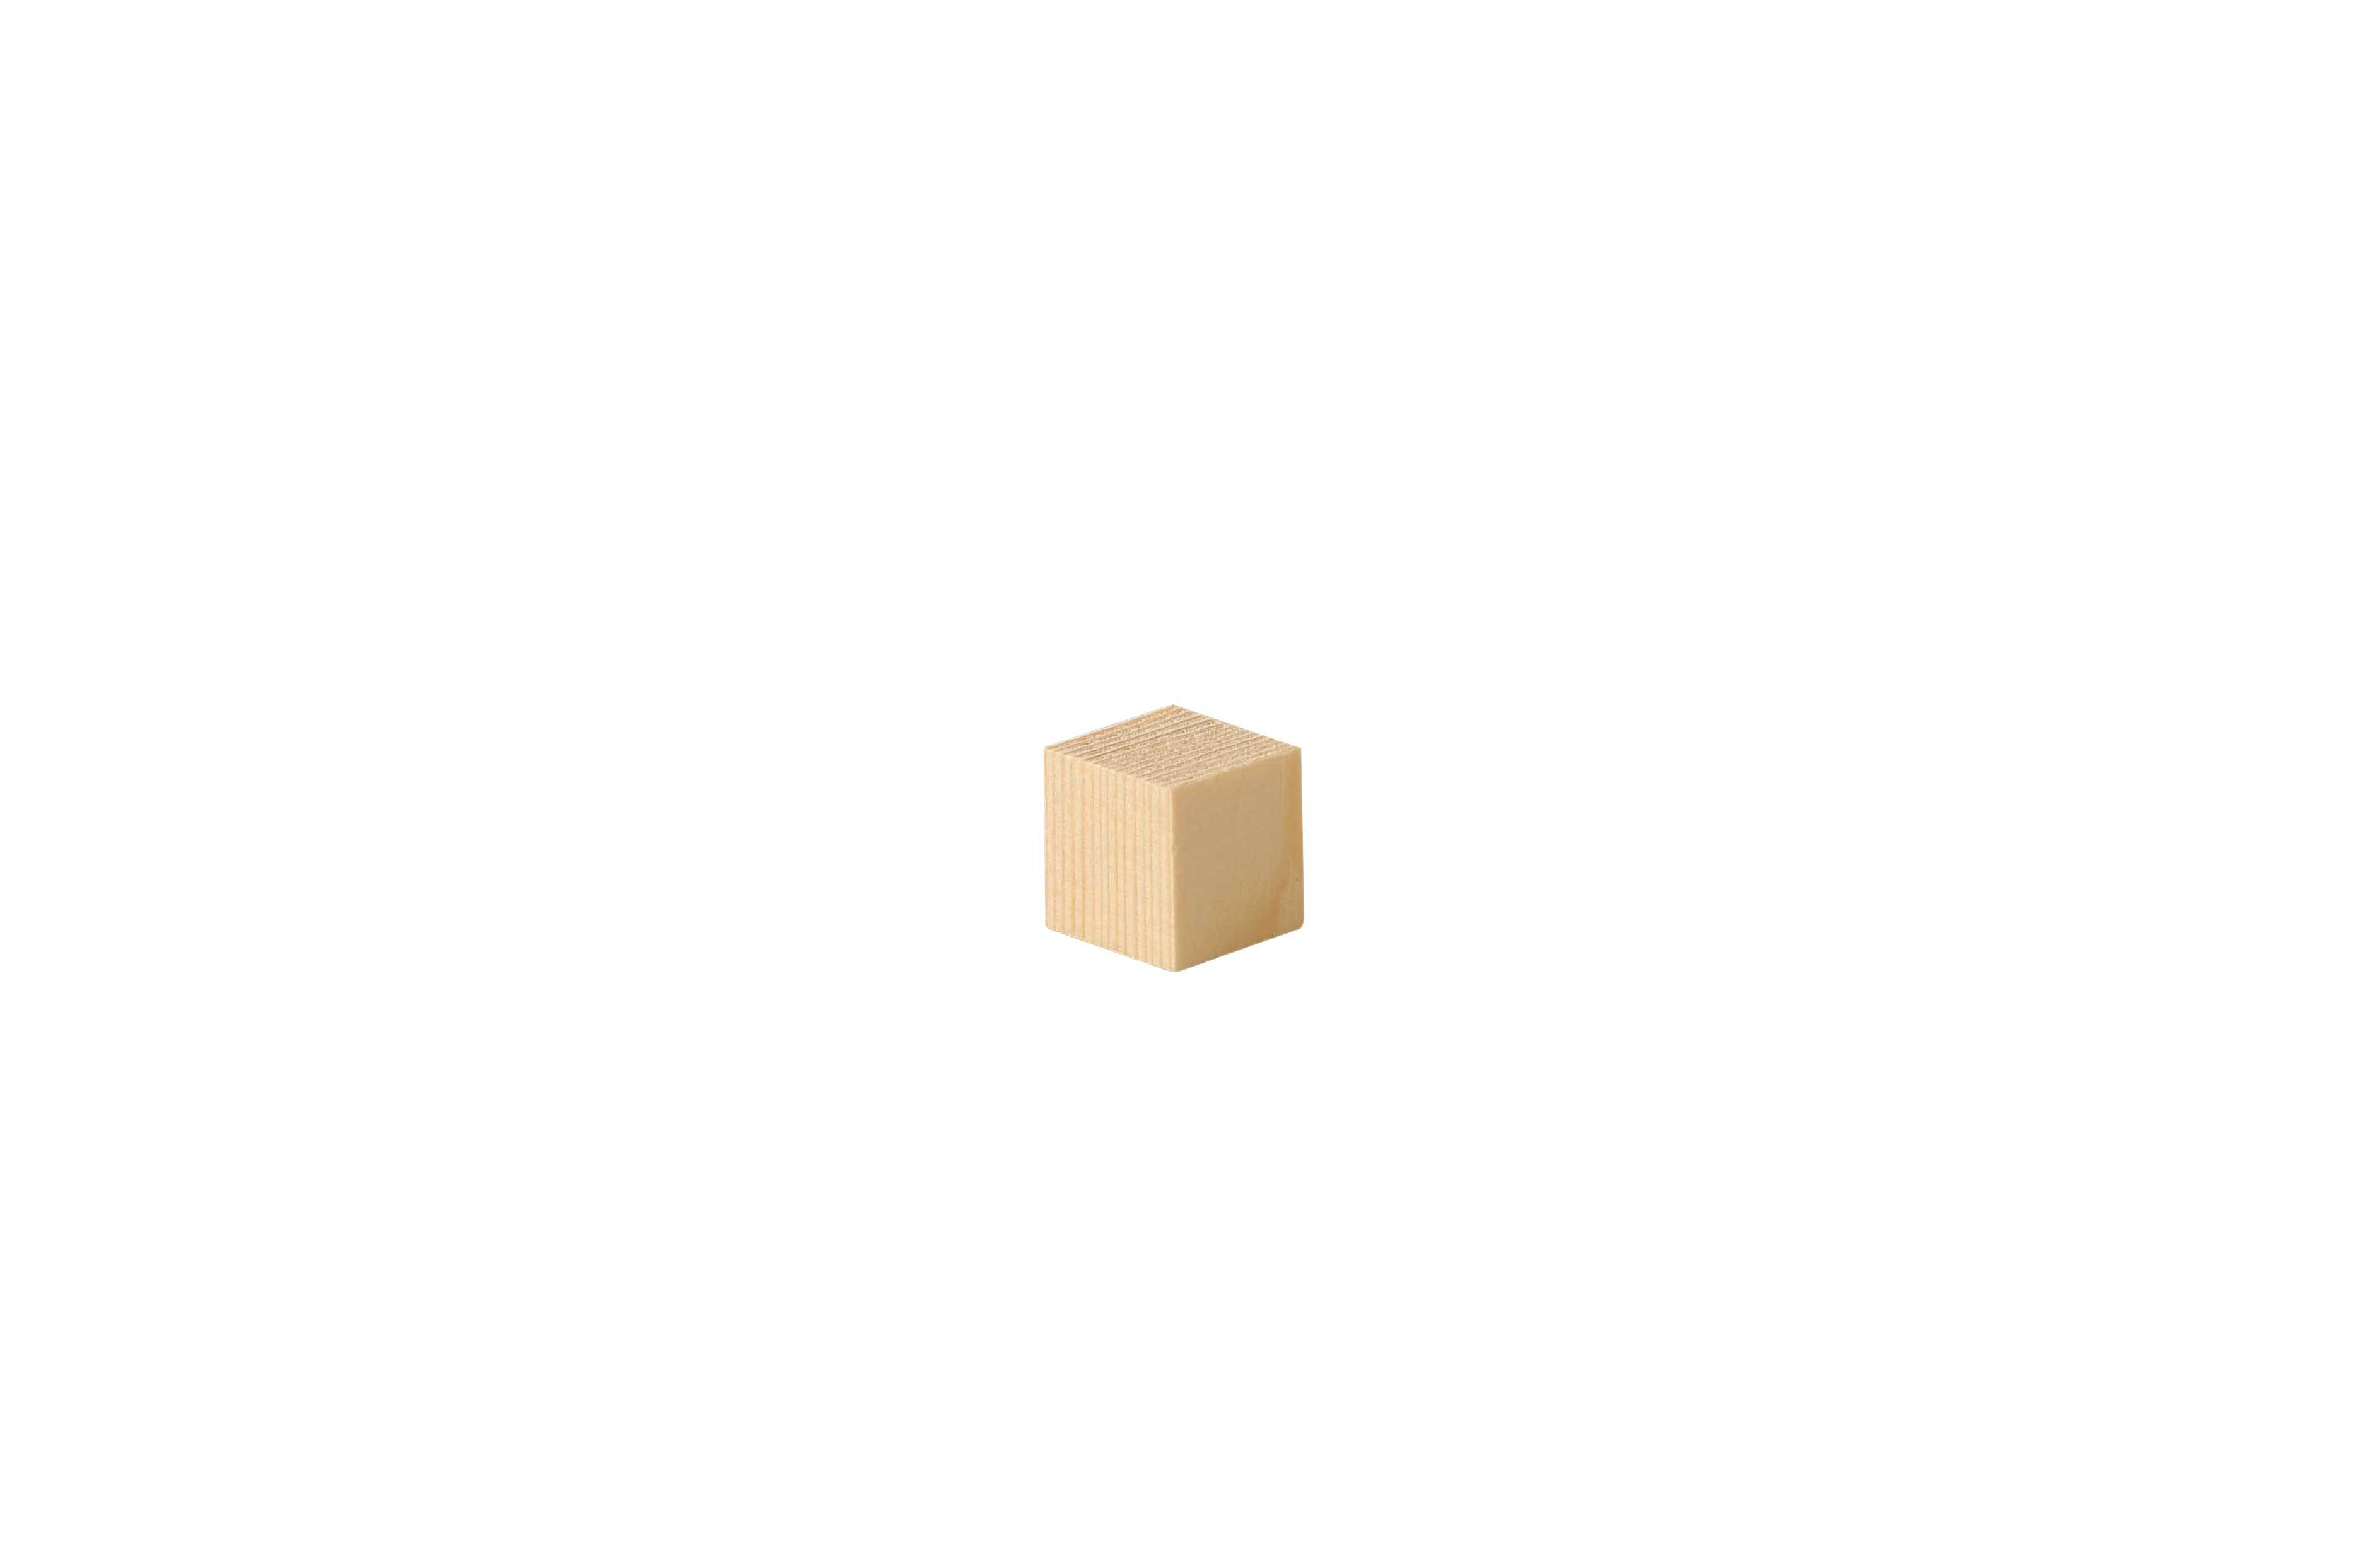 Blokjes klein - 50 st./pak, 20 x 20 mm